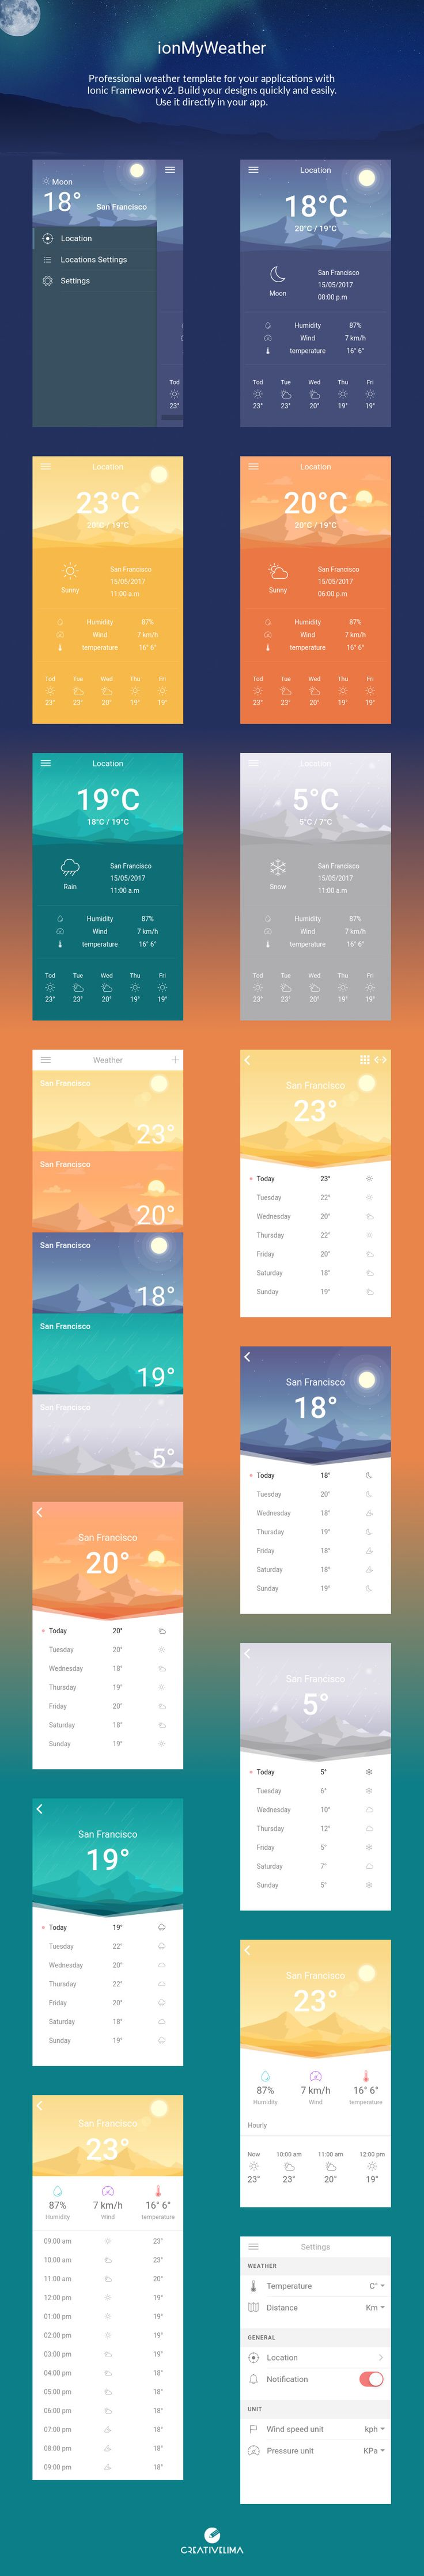 ionMyWeather - Theme - Ionic Framework - ui - app